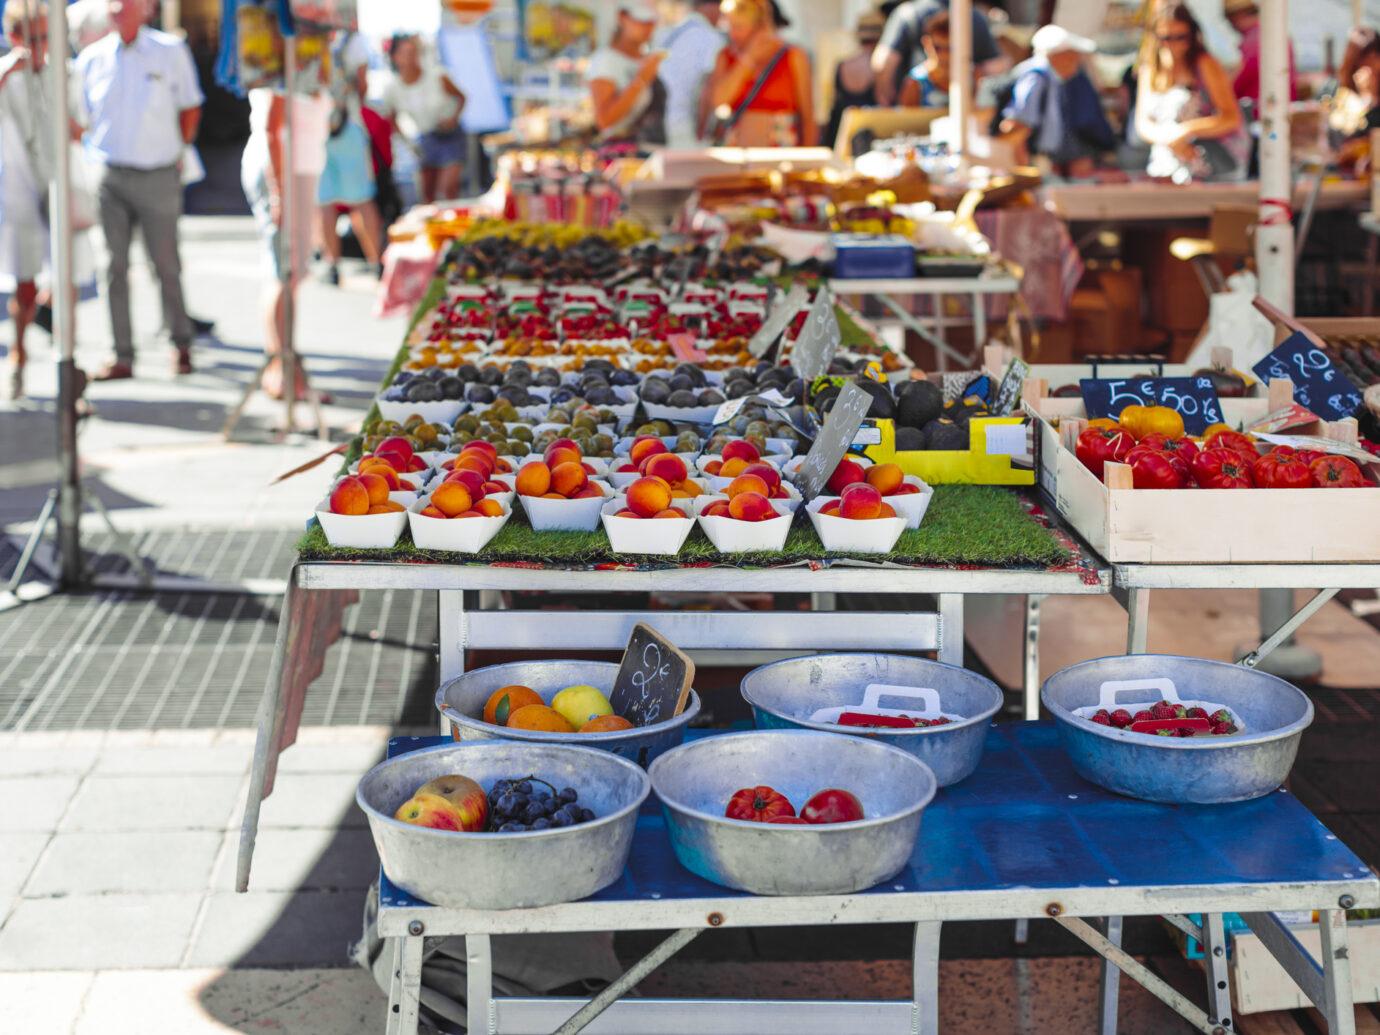 Cours Saleya flower market in Nice, France